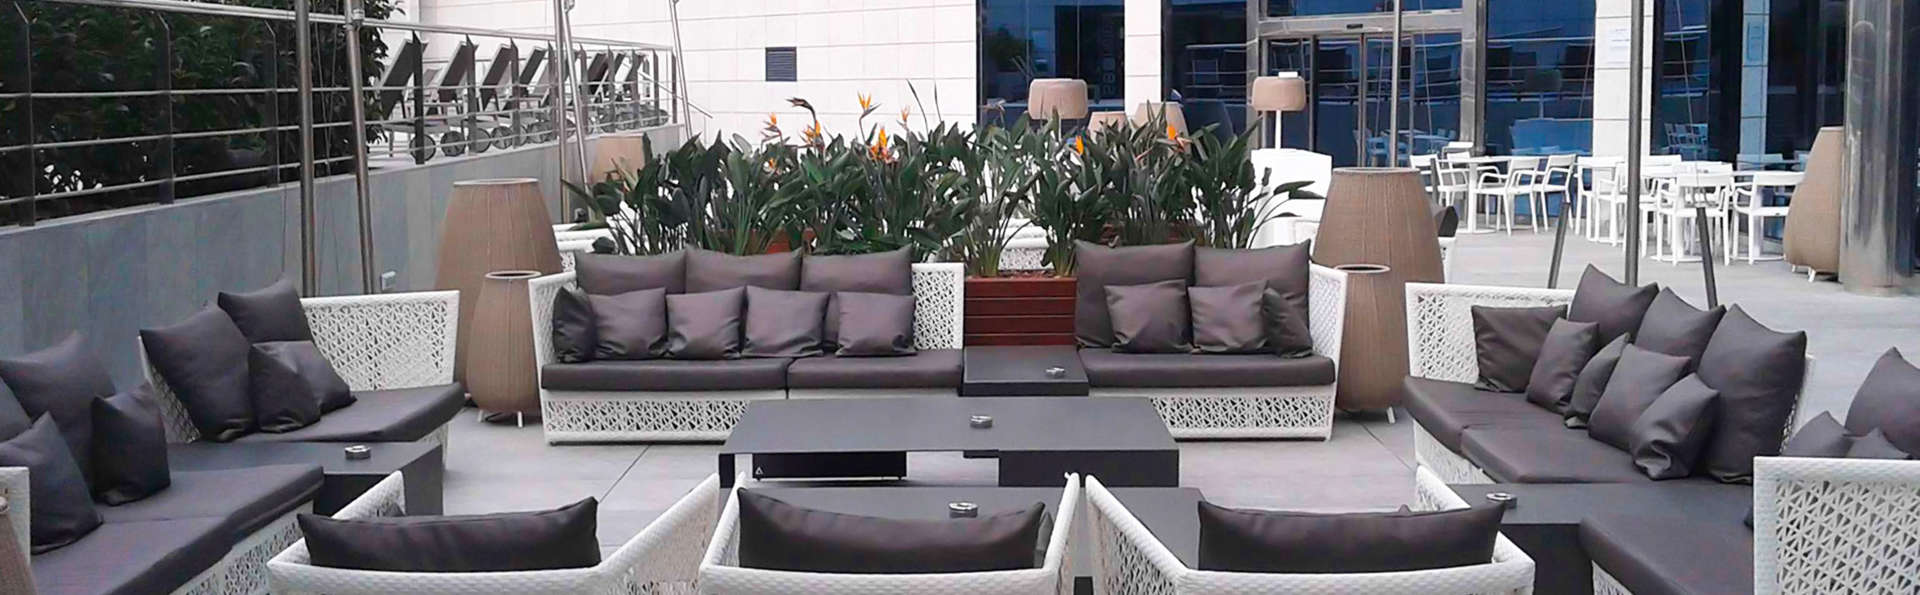 Hotel SB Icaria Barcelona - edit_terrace1.jpg